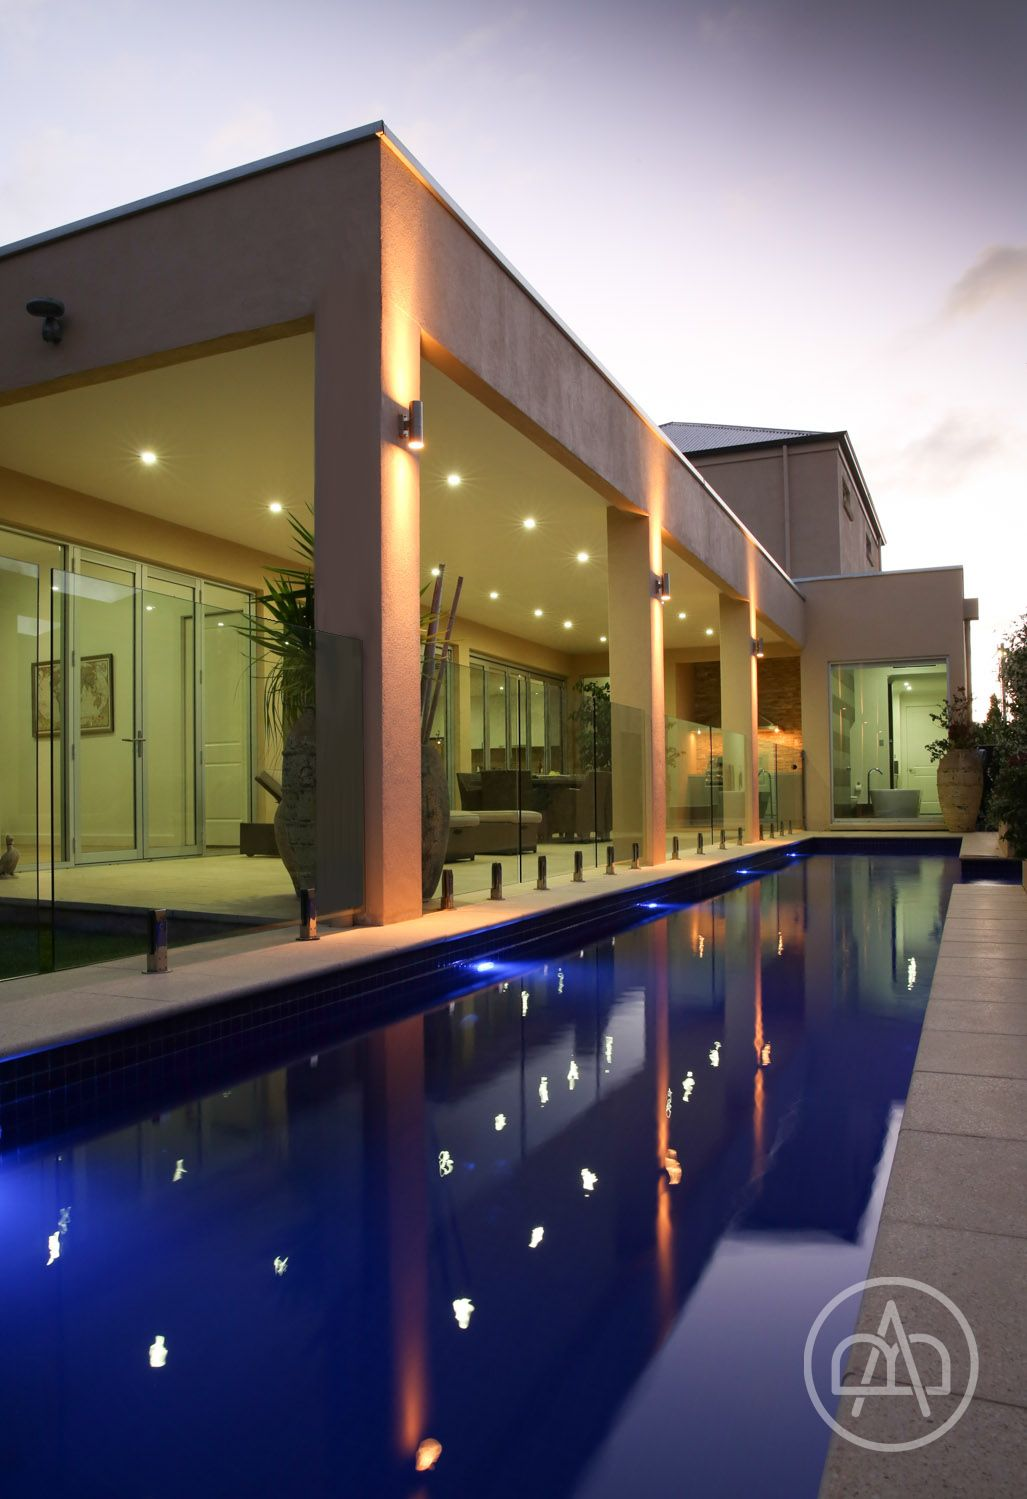 Designed by Atelier Bond https://www.facebook.com/atelierbond1?ref=hl